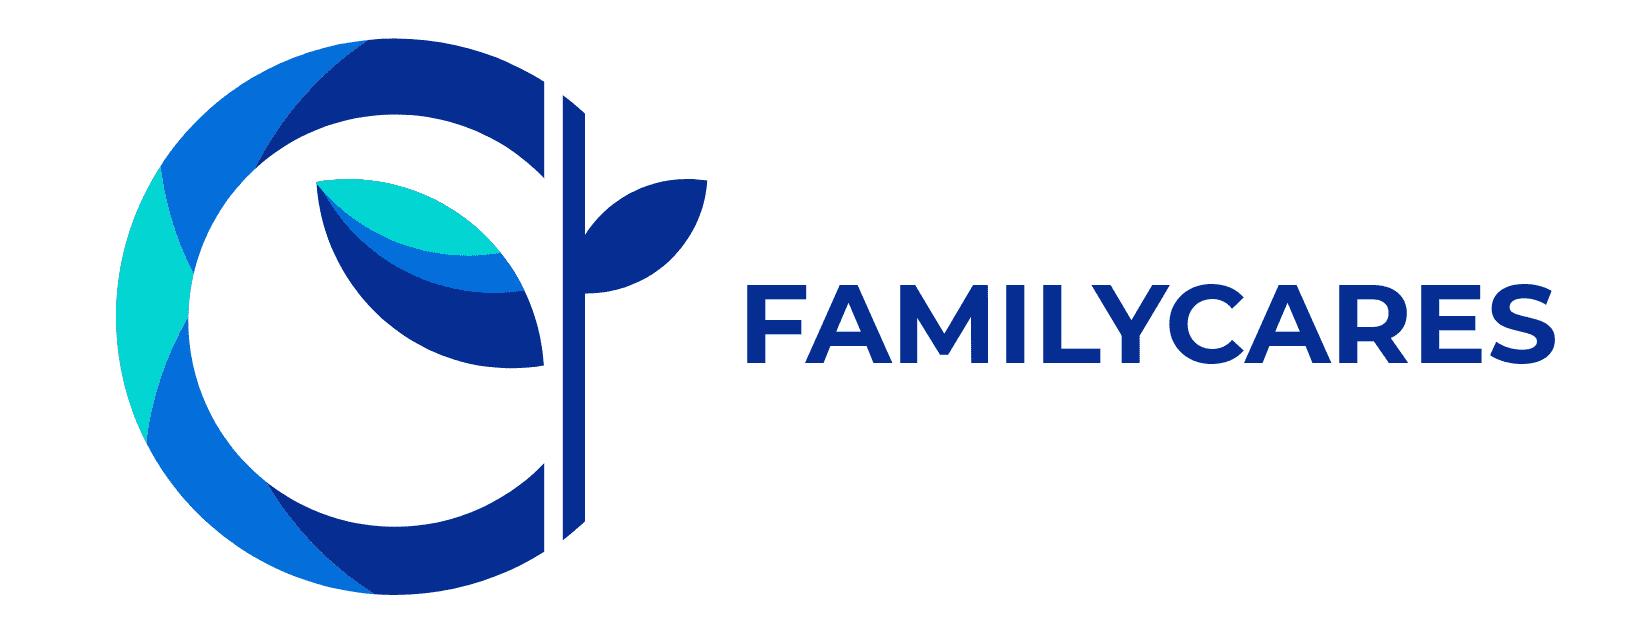 FAMILYCARES